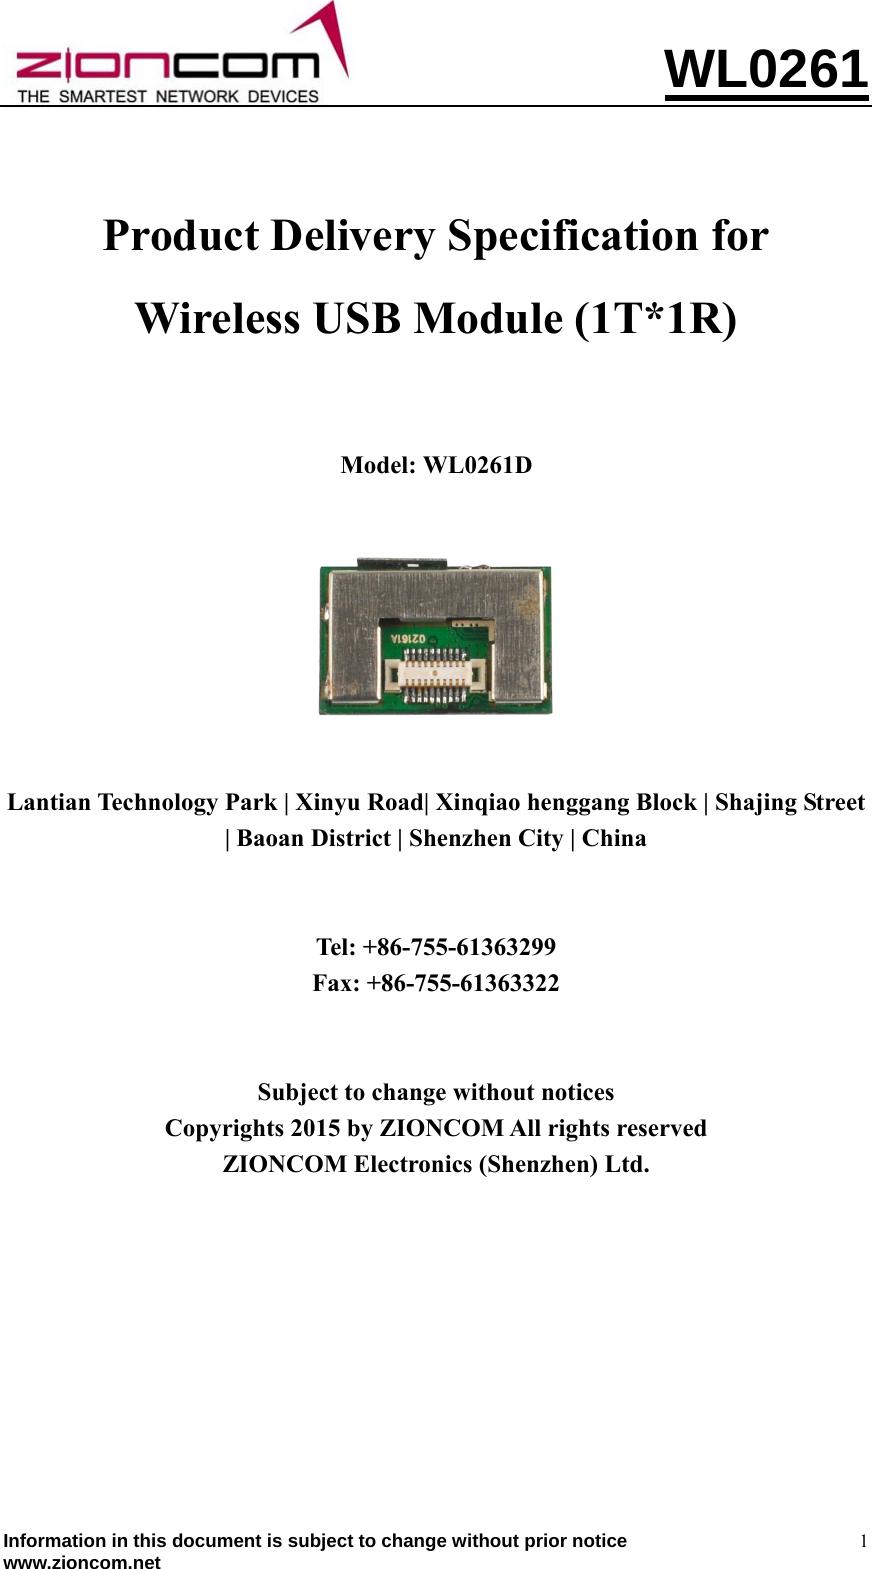 sung woo electronics sw15wl0261 wifi module user manual zc wl0261d rh usermanual wiki Access Data Sheet Sensor Datasheet